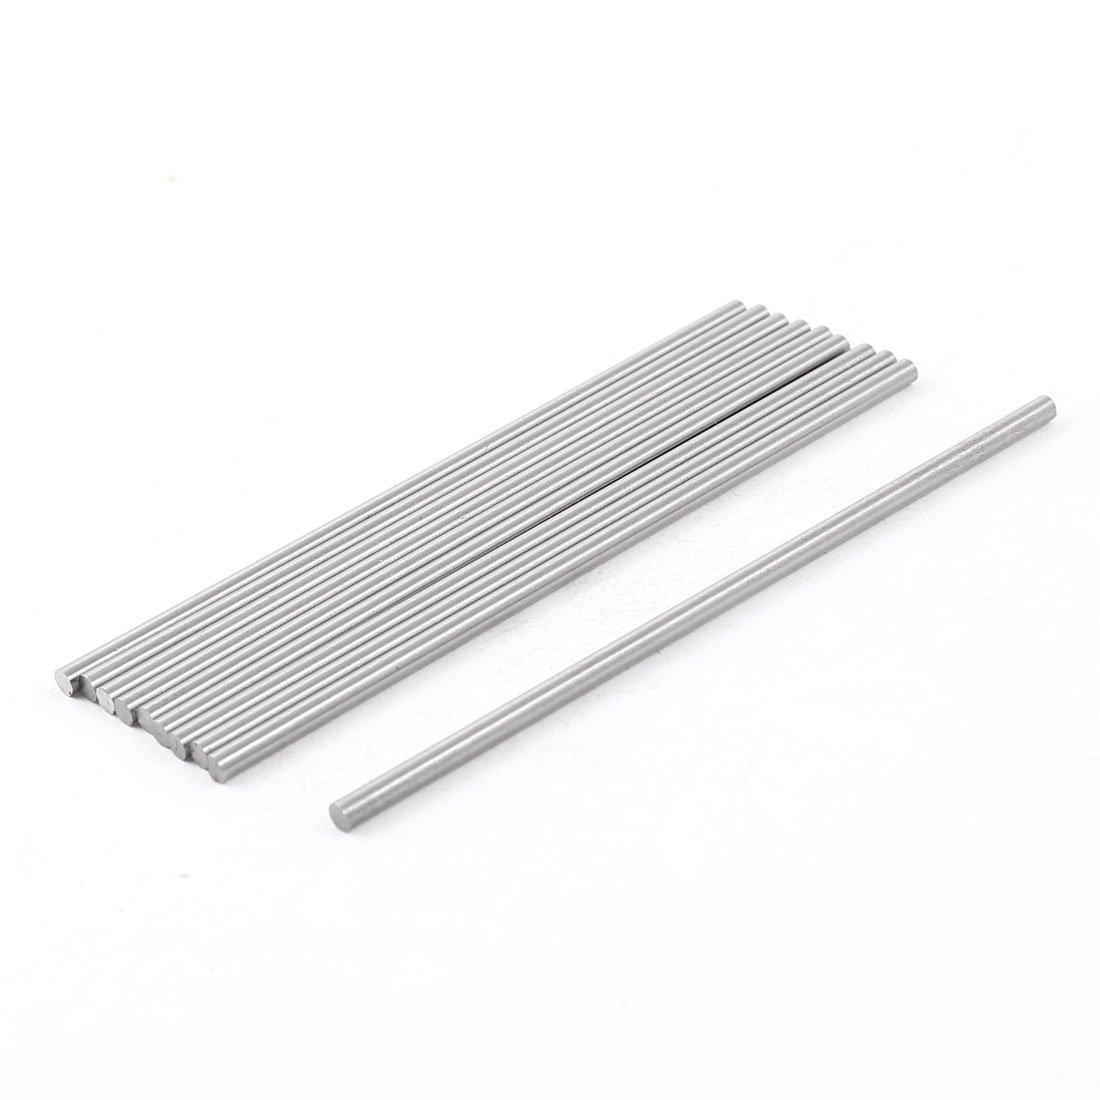 10 PCS 3mm Diameter 100mm Long Boring Tool Round Turning Lathe Bars DealMux DLM-B00MJSBNZW